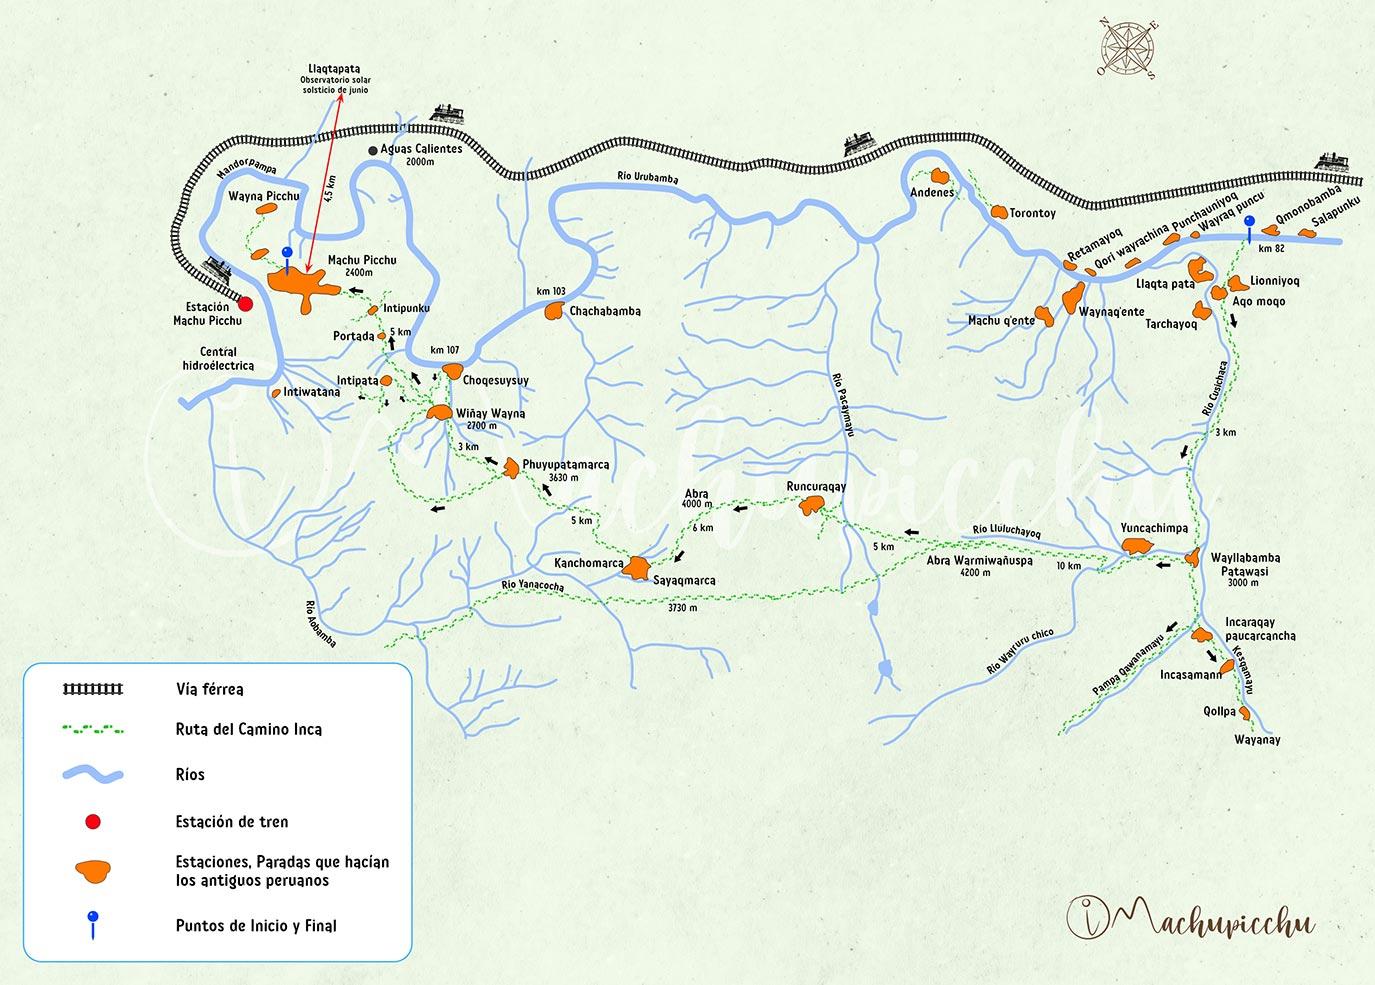 Ruta del Camino Inca Clásico